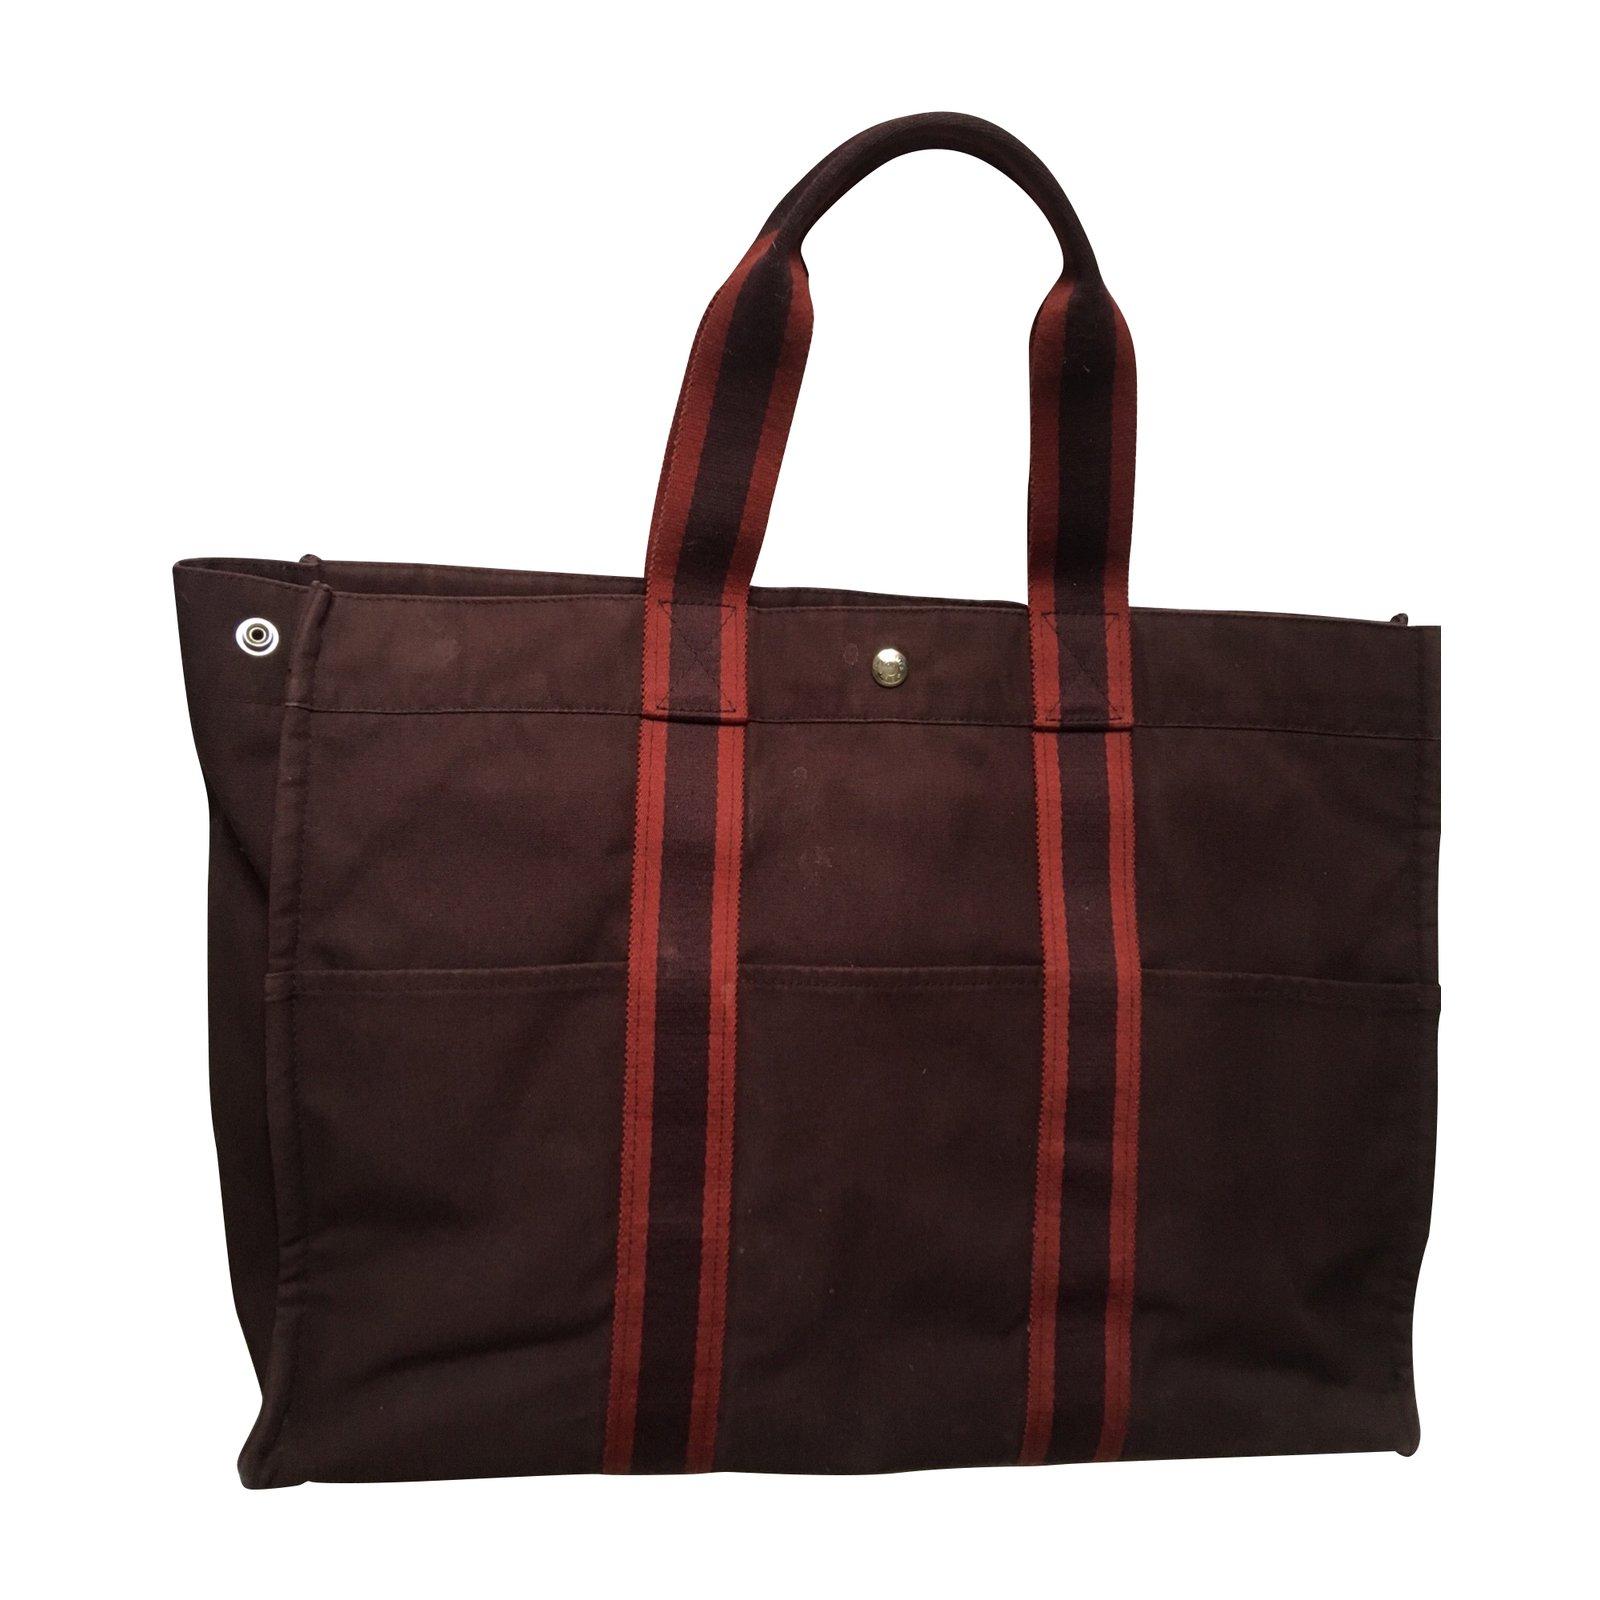 13e56c4b7894 Hermès Toto Large model 800 Eur Totes Cotton Dark red ref.103957 ...